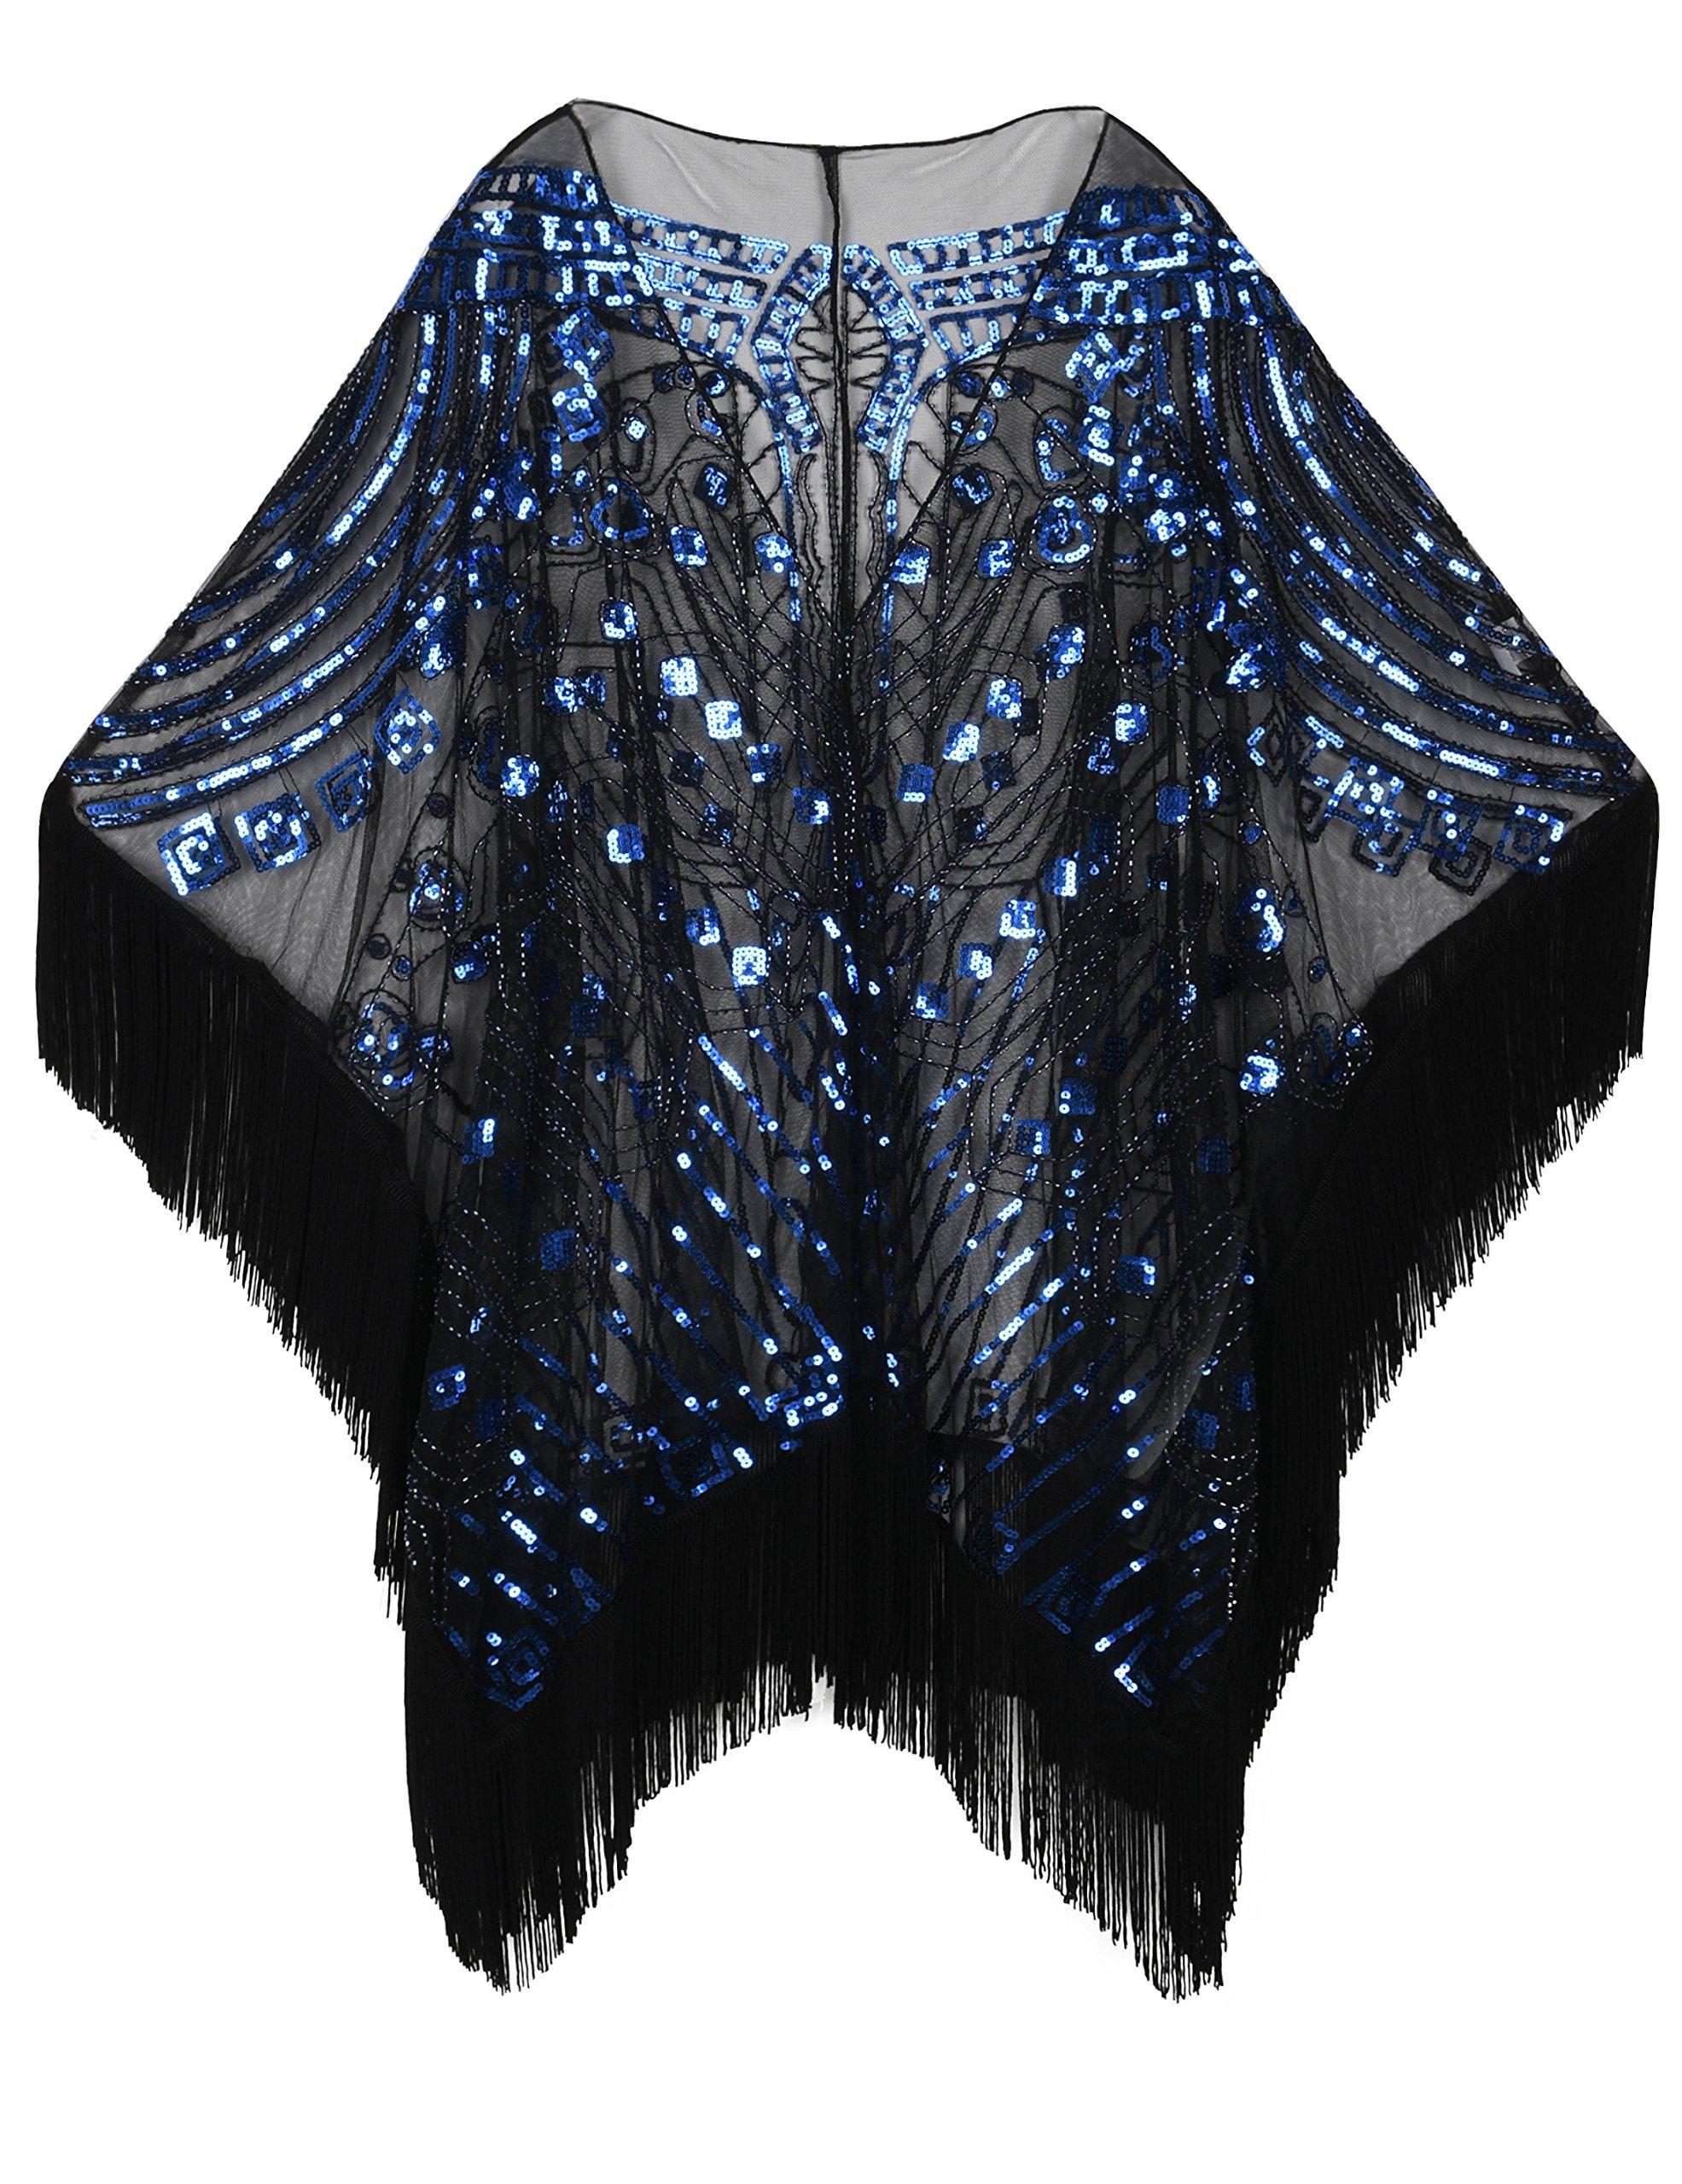 PrettyGuide Women's 1920s Shawl Beaded Evening Wrap Open Front Fringed Cape Black Blue